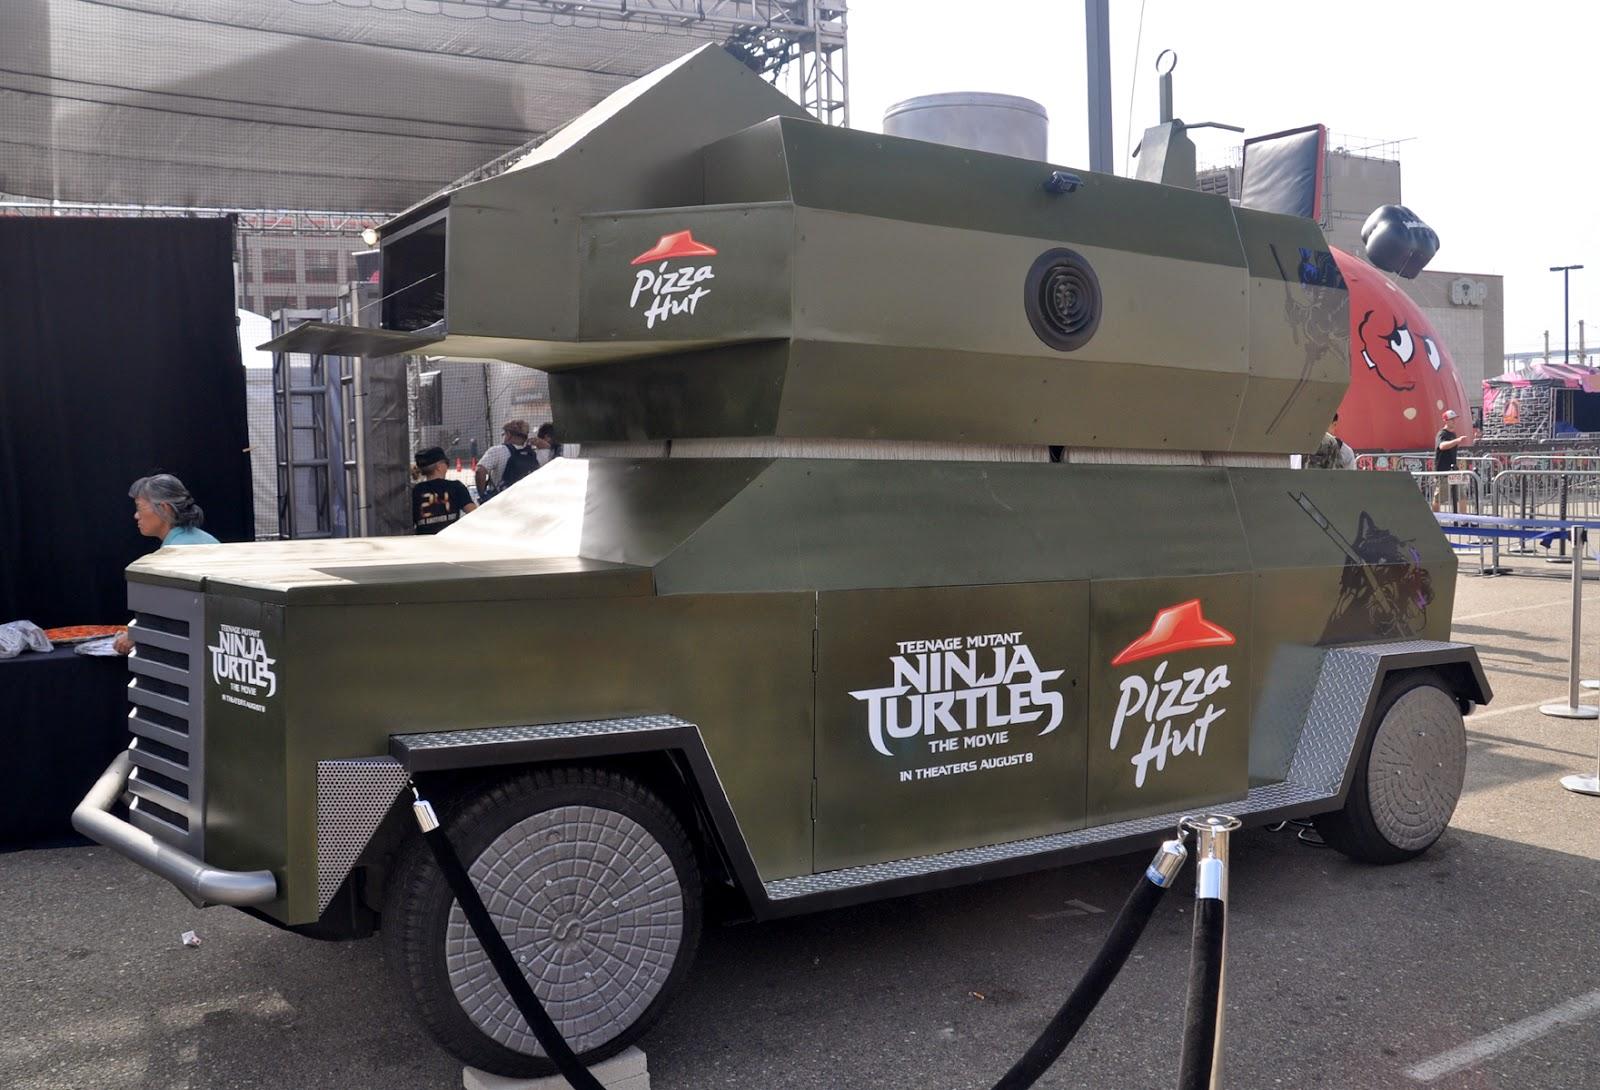 Lanceur de pizza grandeur nature yopaky - Tortues ninja pizza ...